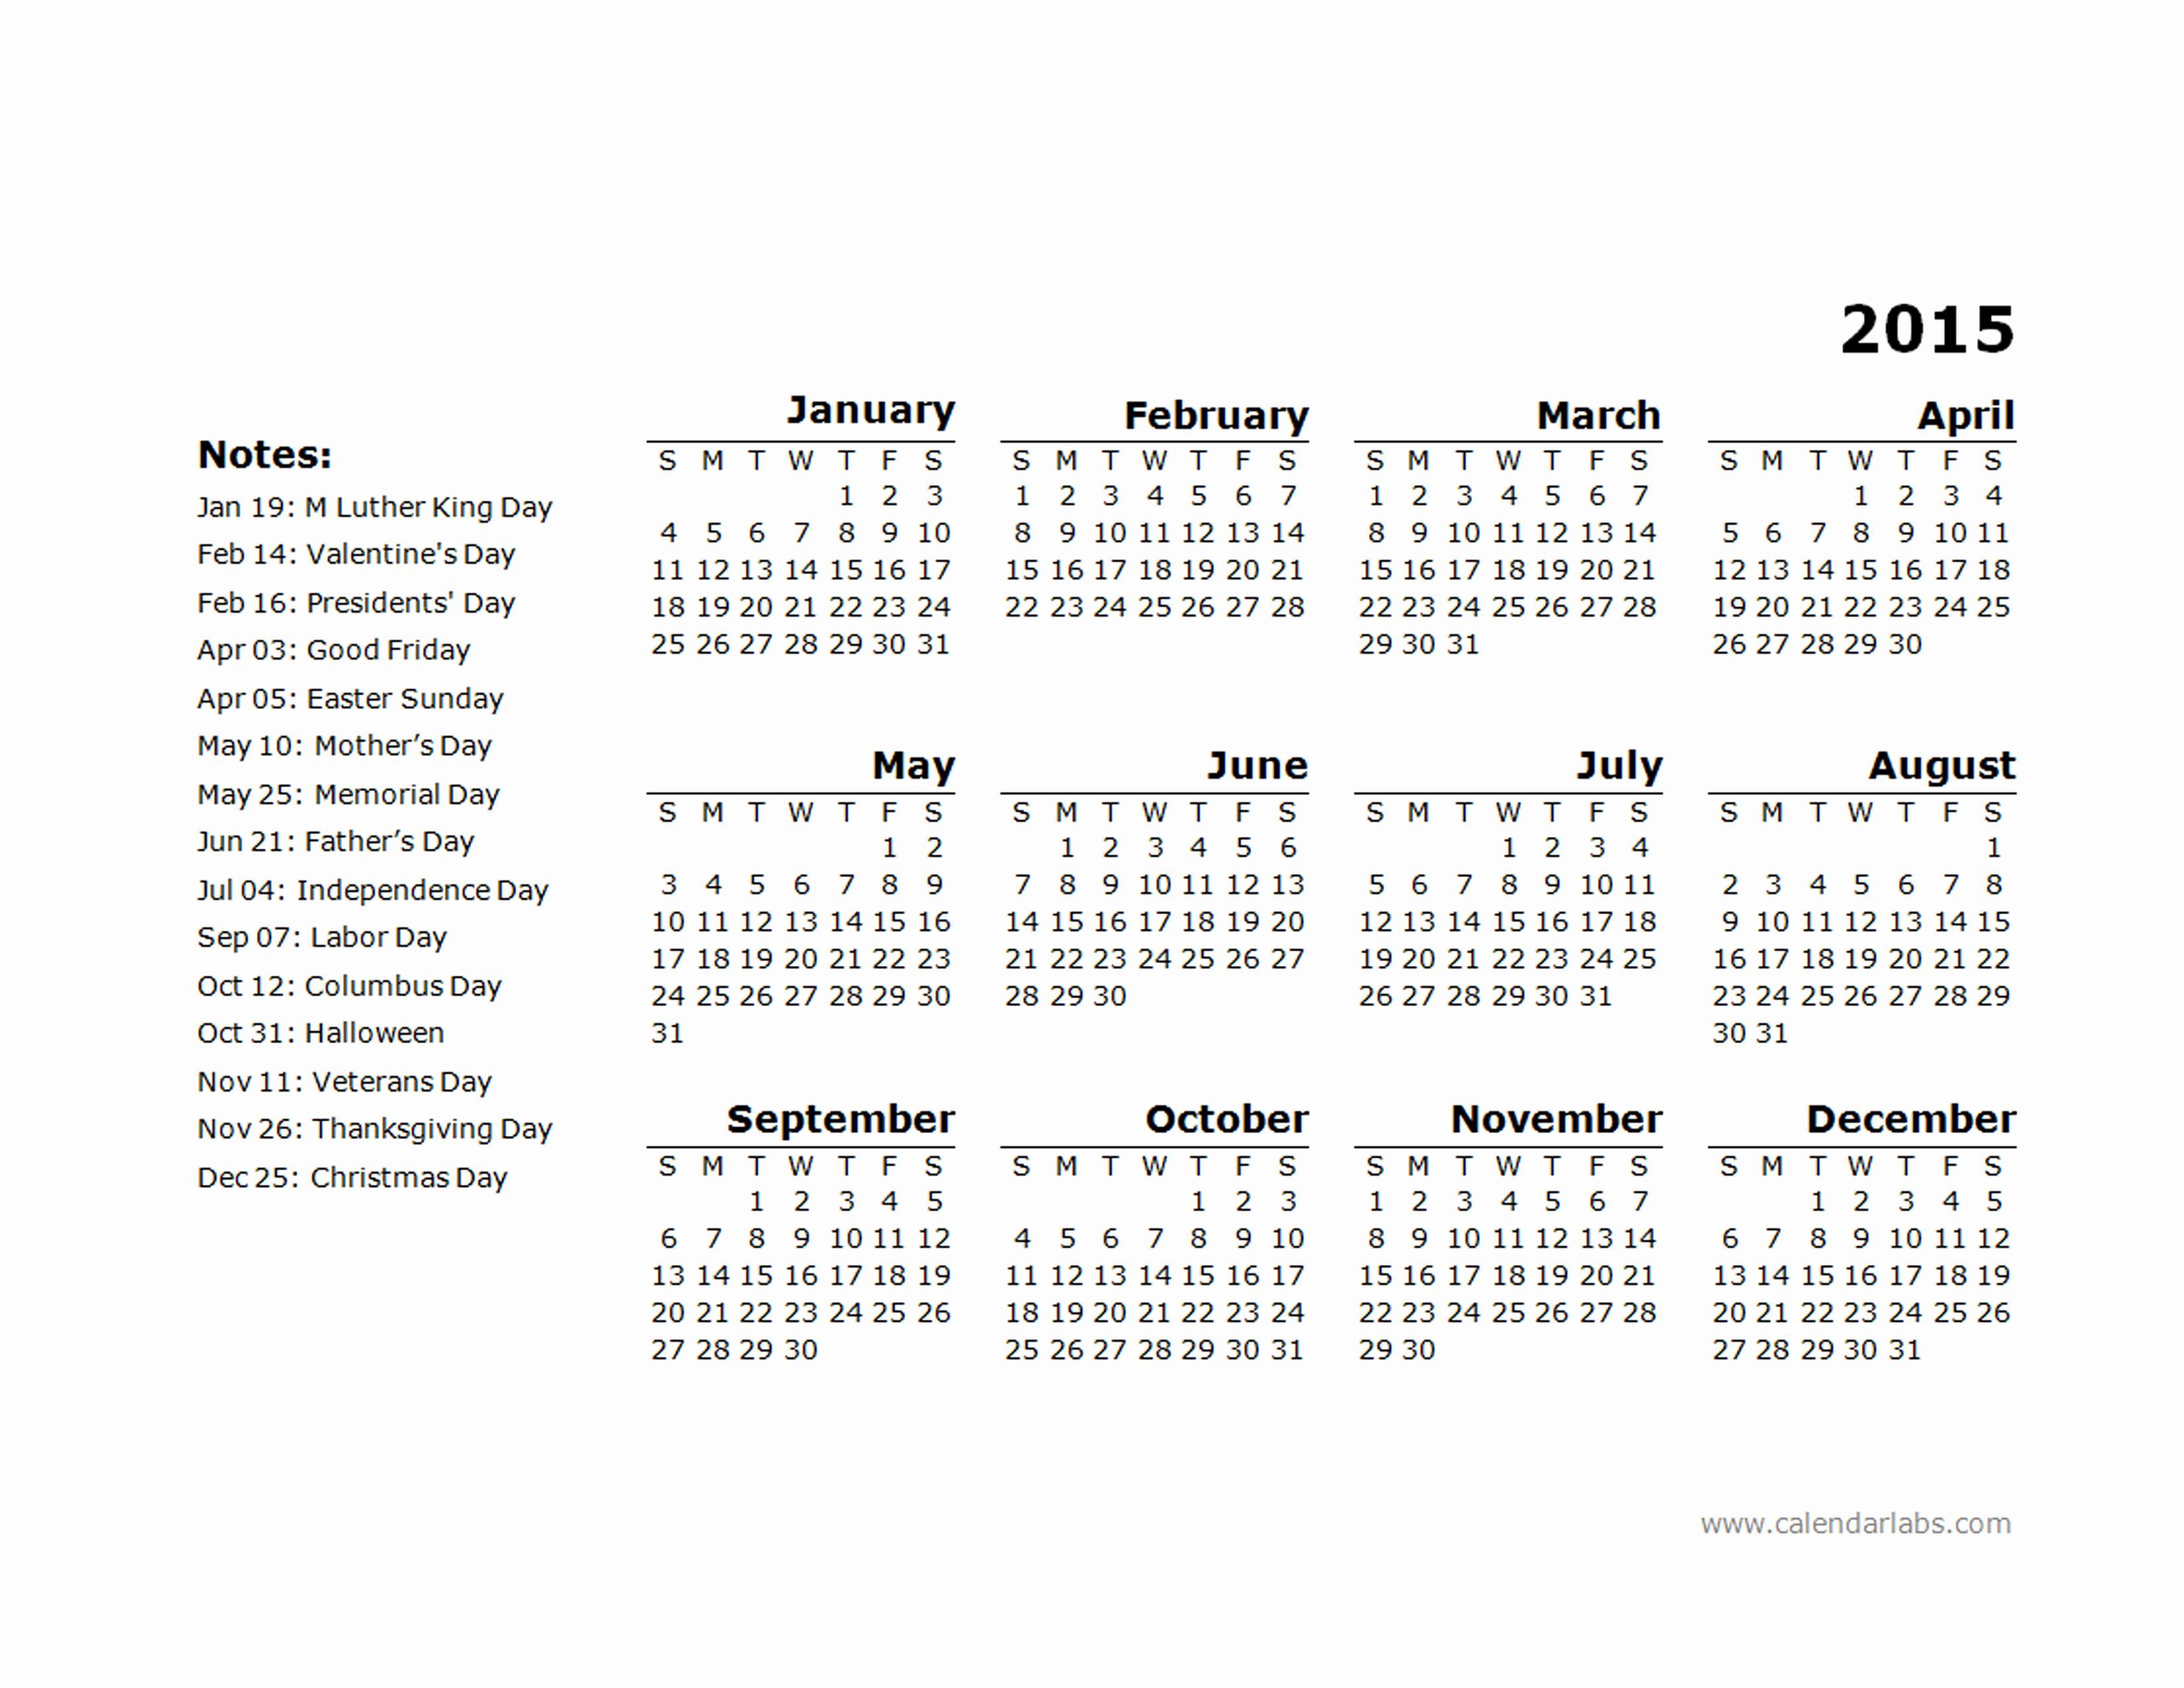 2015 Yearly Calendar Printable Landscape Fresh 2015 Yearly Calendar Template 11 Free Printable Templates